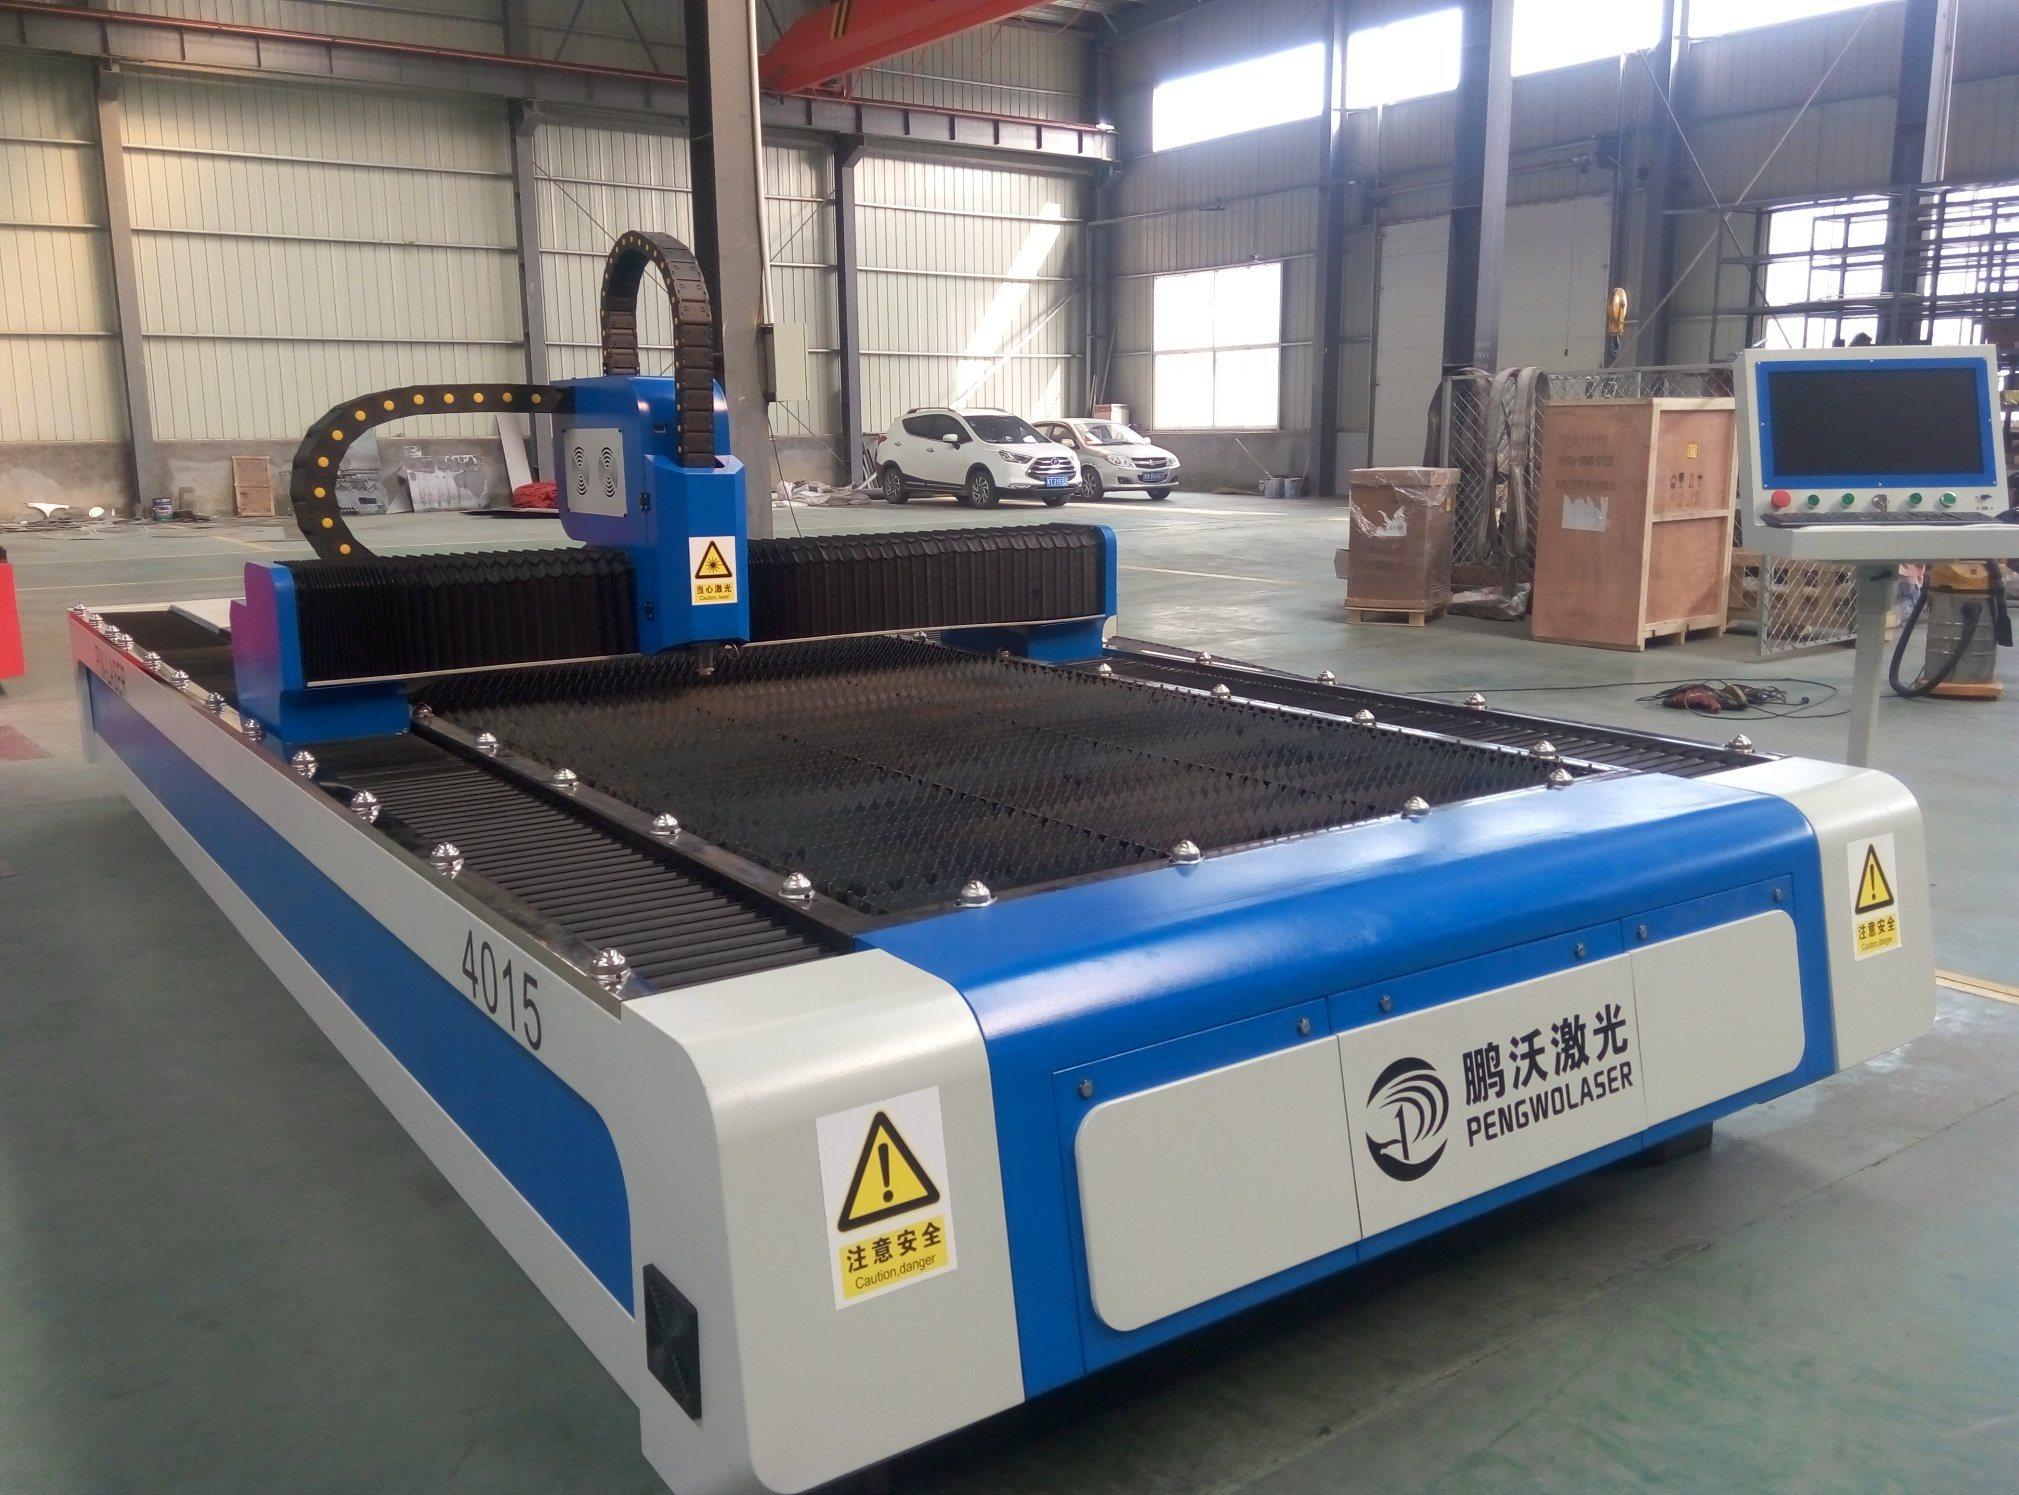 High Power Fiber Cutting Machine with CNC Laser